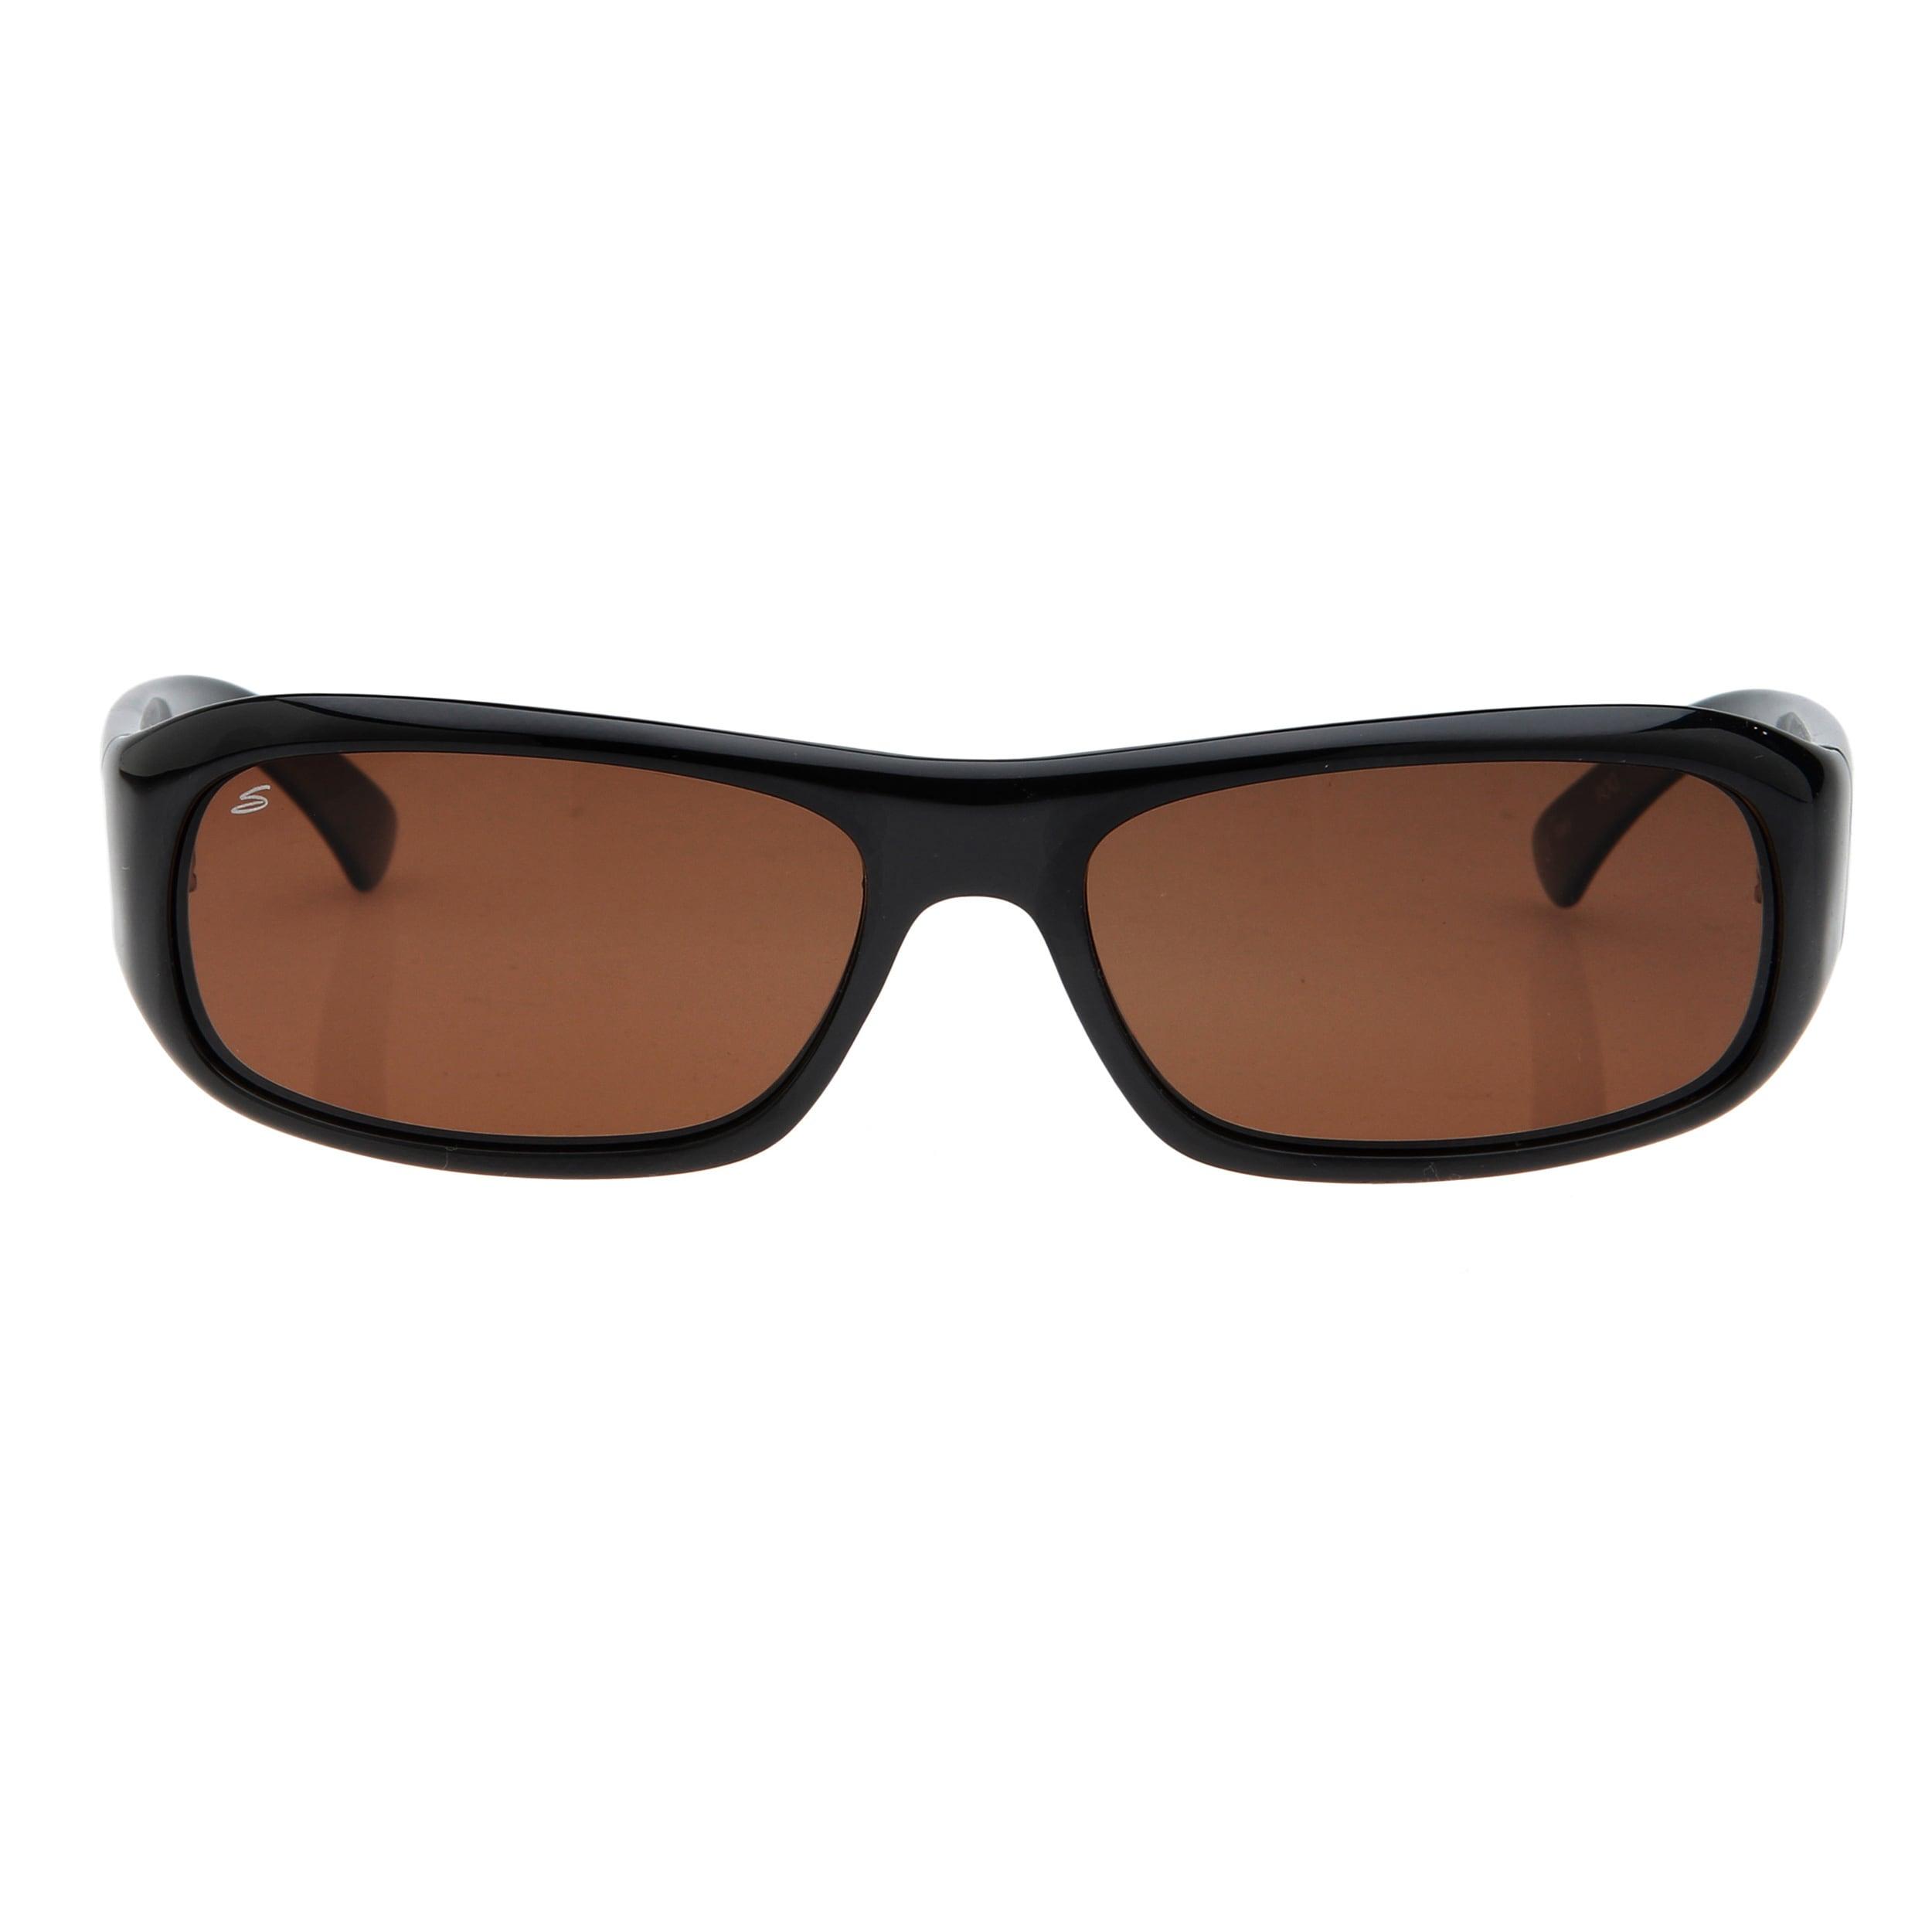 faa054f10865 Shop Serengeti 'Genova' Men's Polarized Driver Sunglasses - Free Shipping  Today - Overstock.com - 8851590